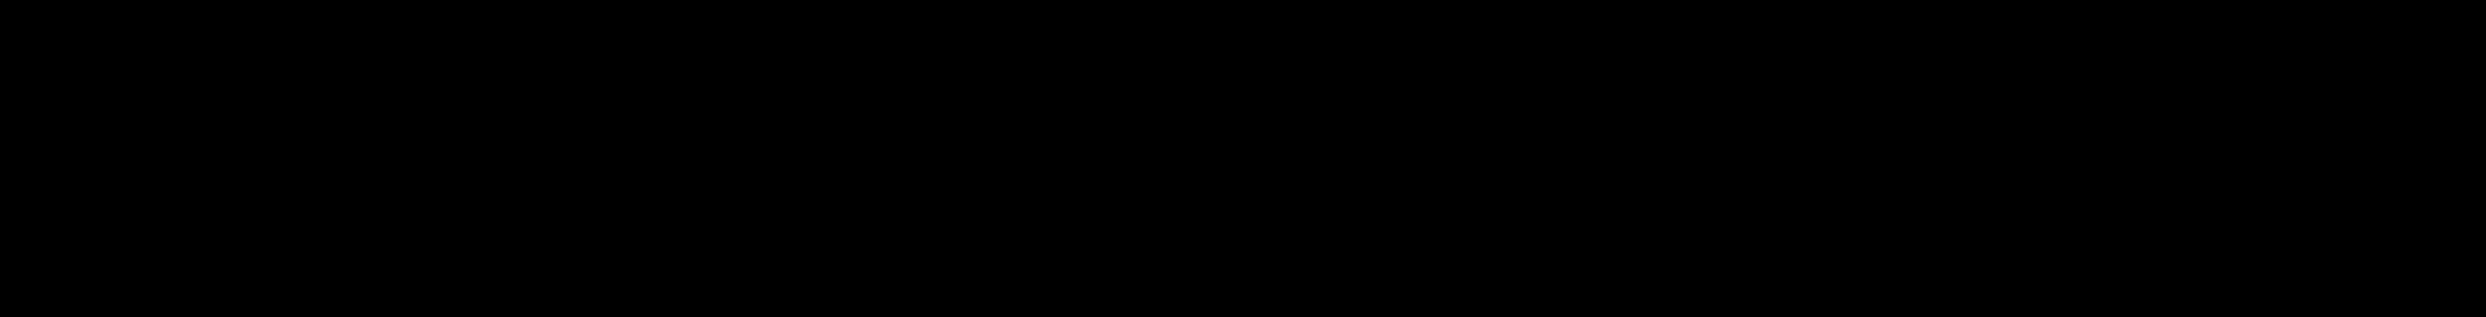 Logo di Loblaw Digital